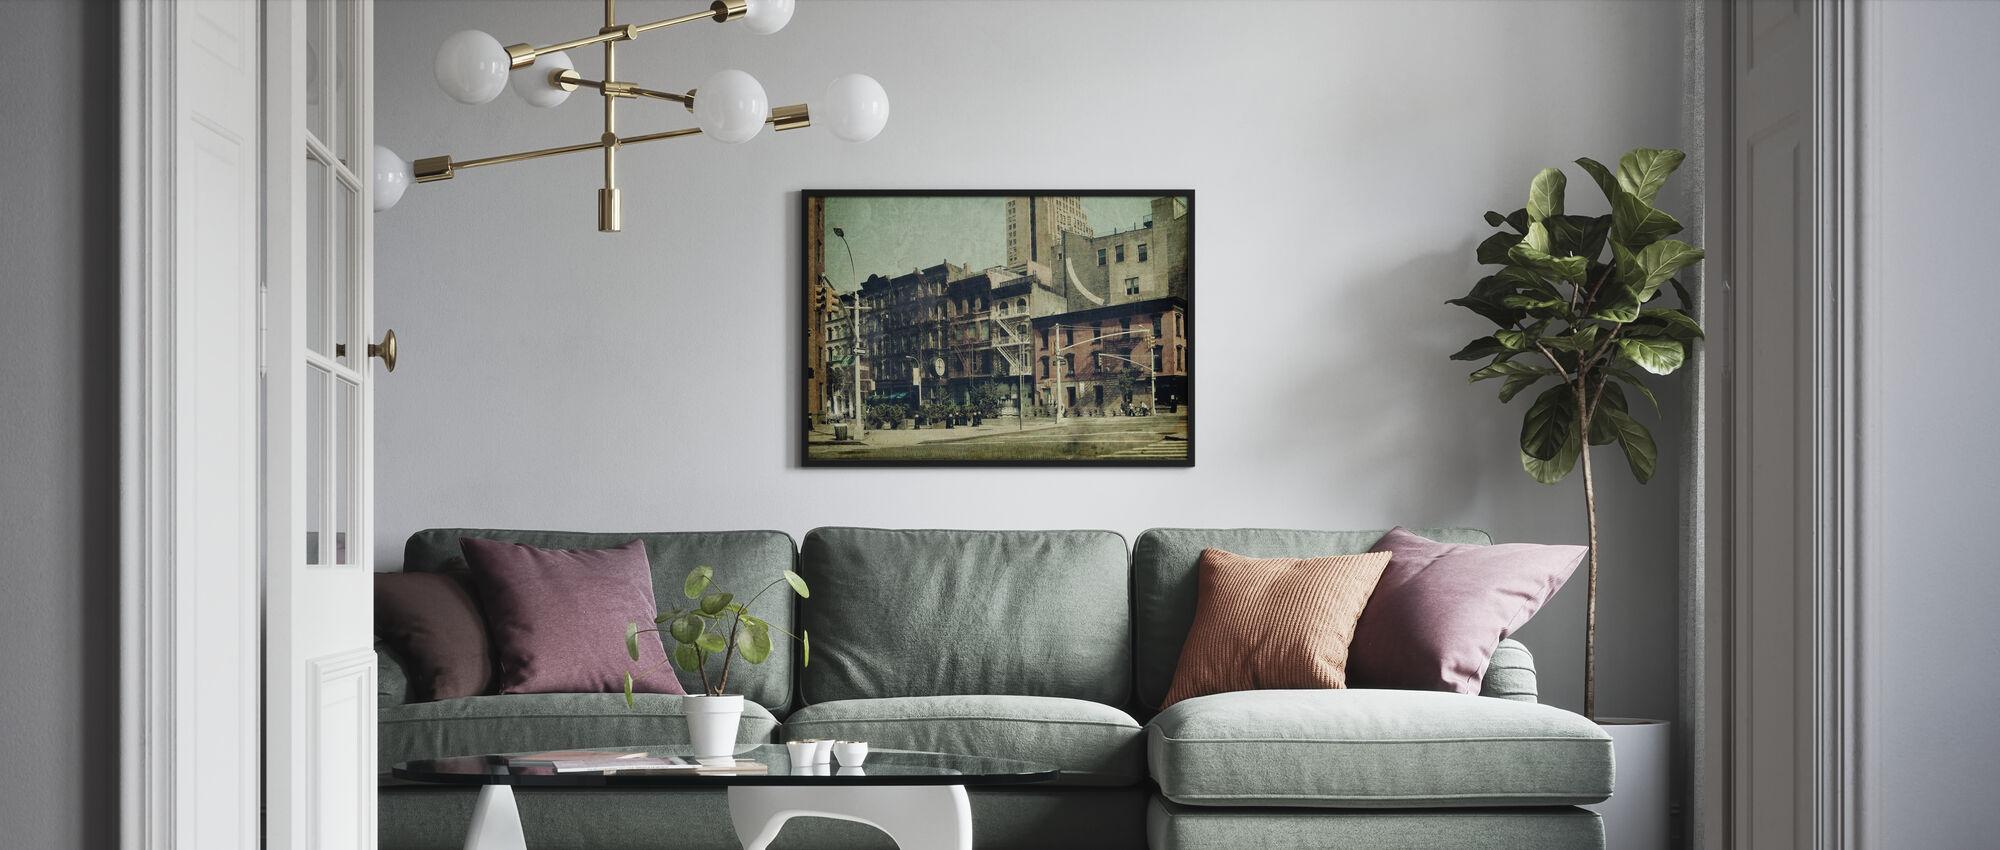 New York City - 6. Avenue - Indrammet billede - Stue